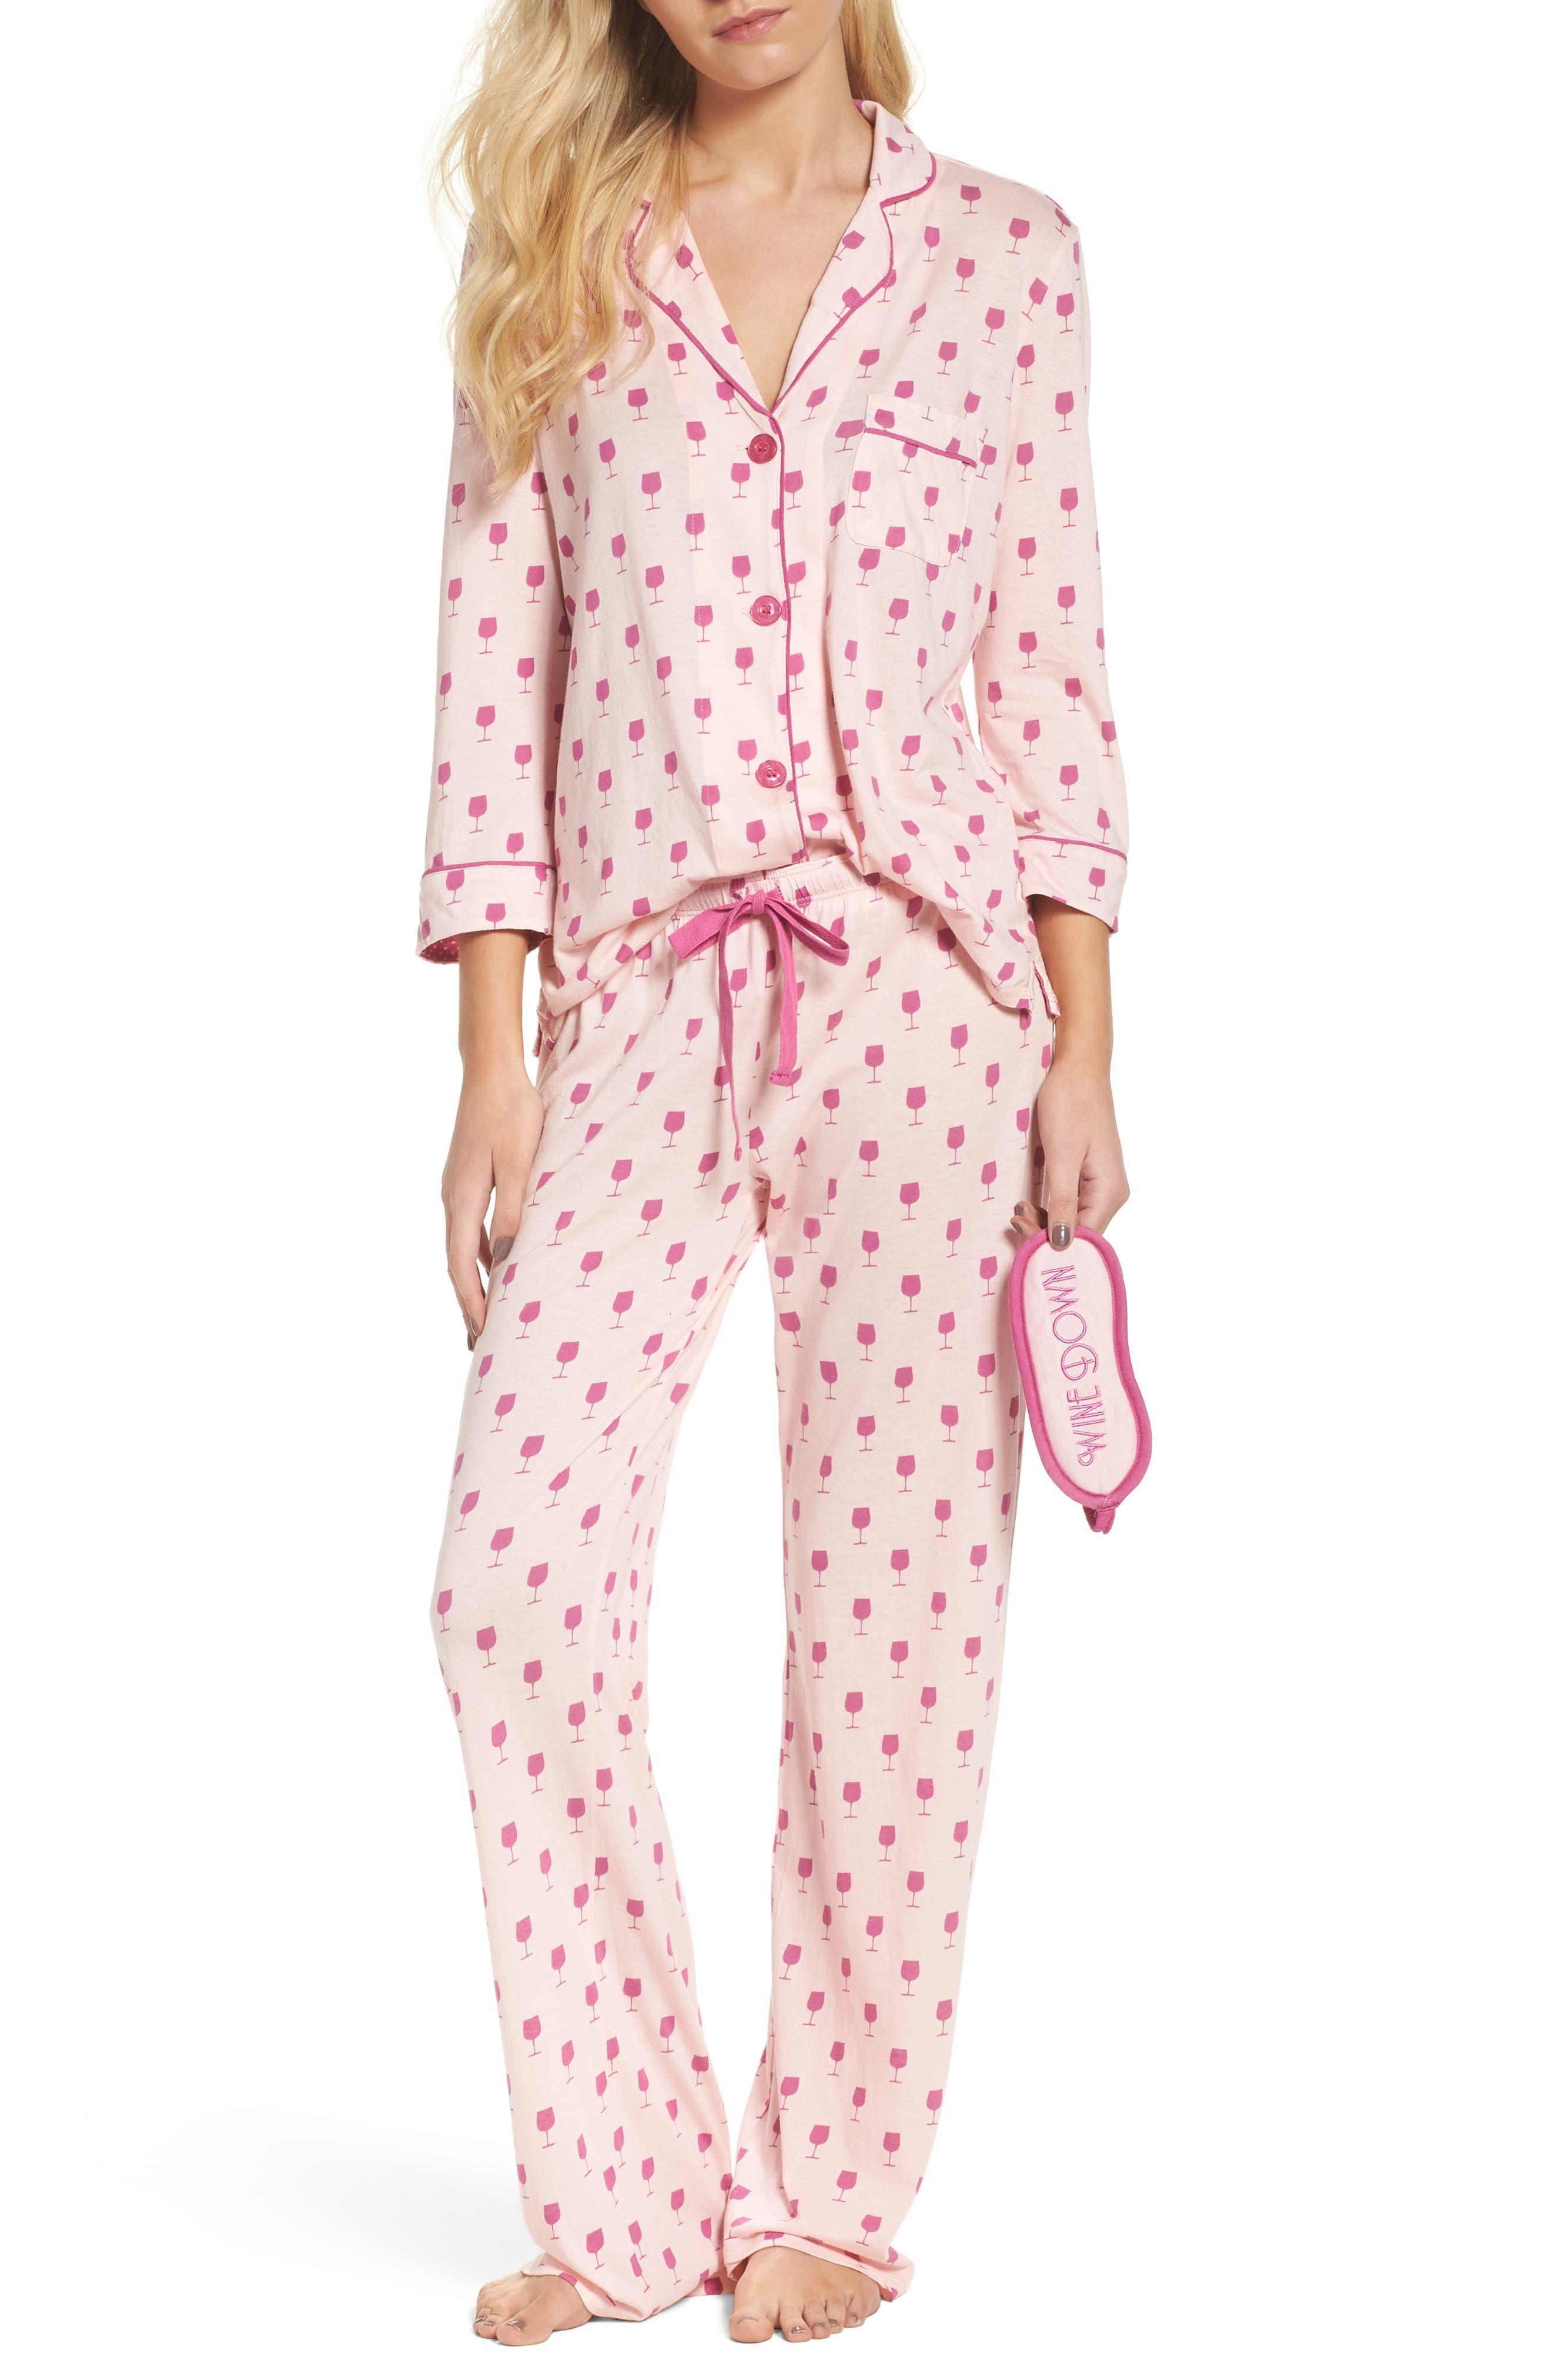 PJ Salvage Playful Print Pajamas & Eye Mask